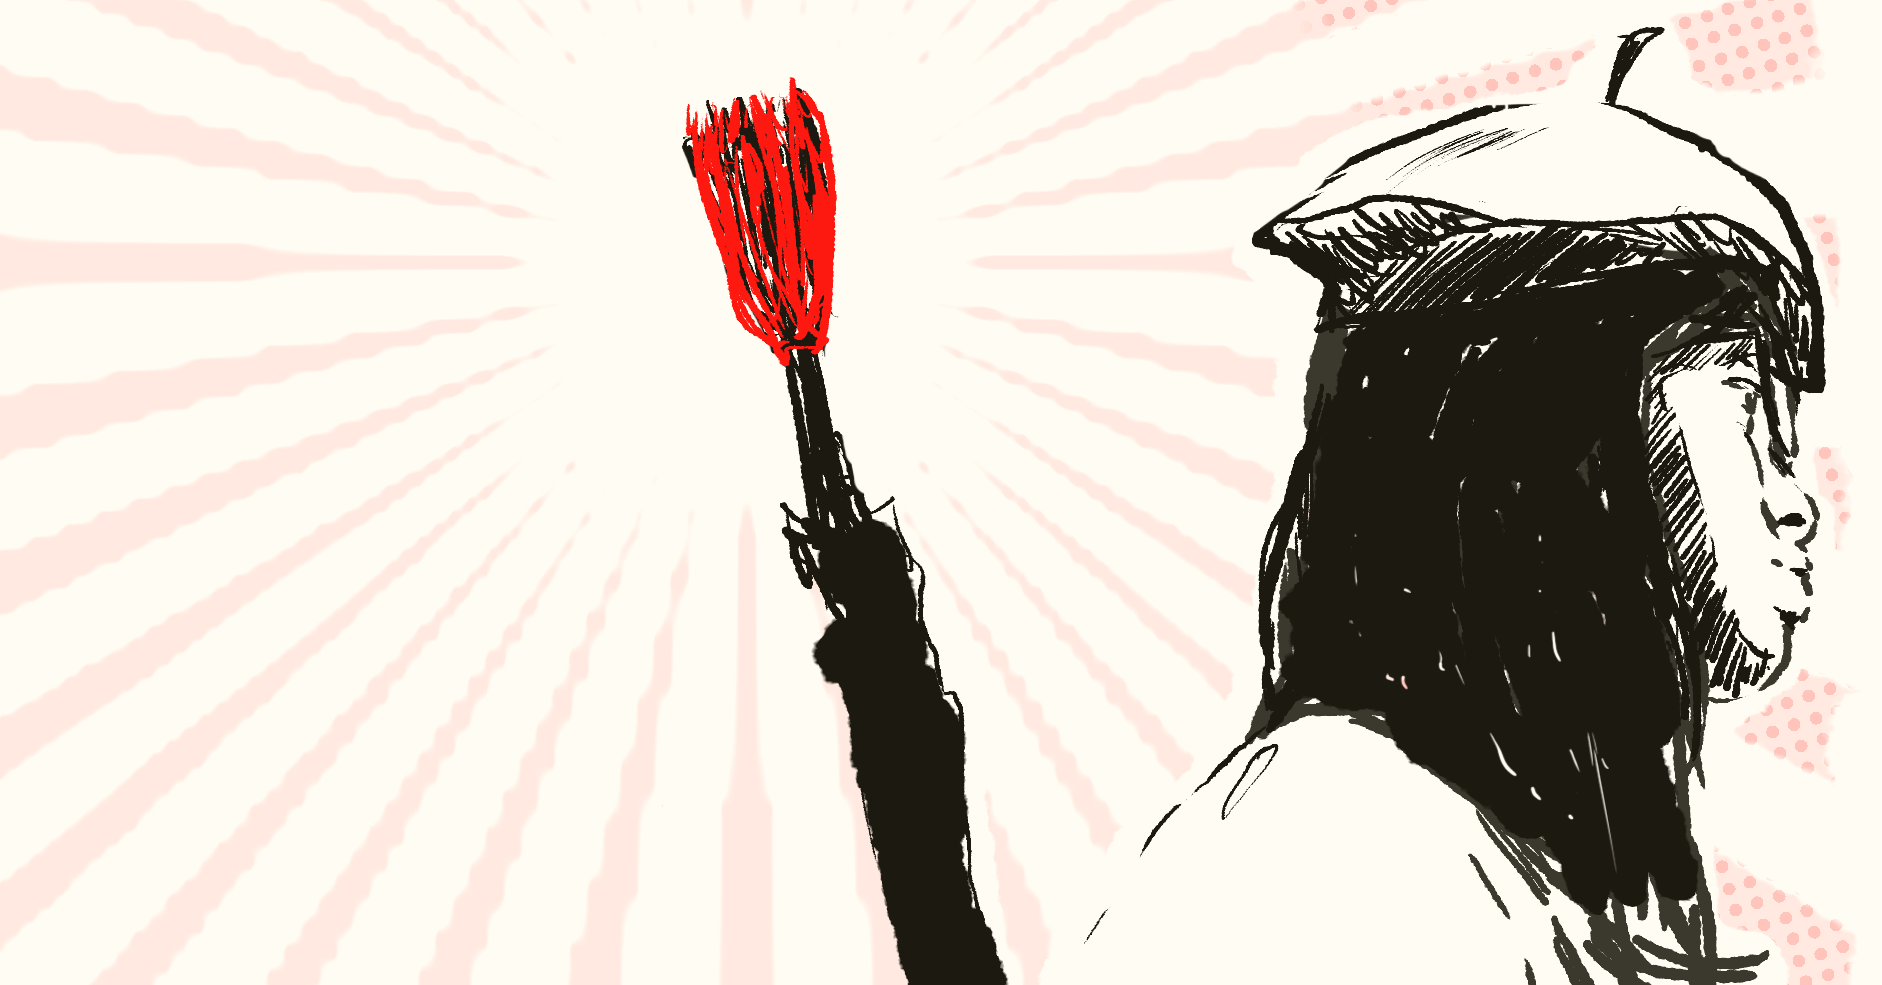 Artist Manifesto: START WARS; GROW ART!!